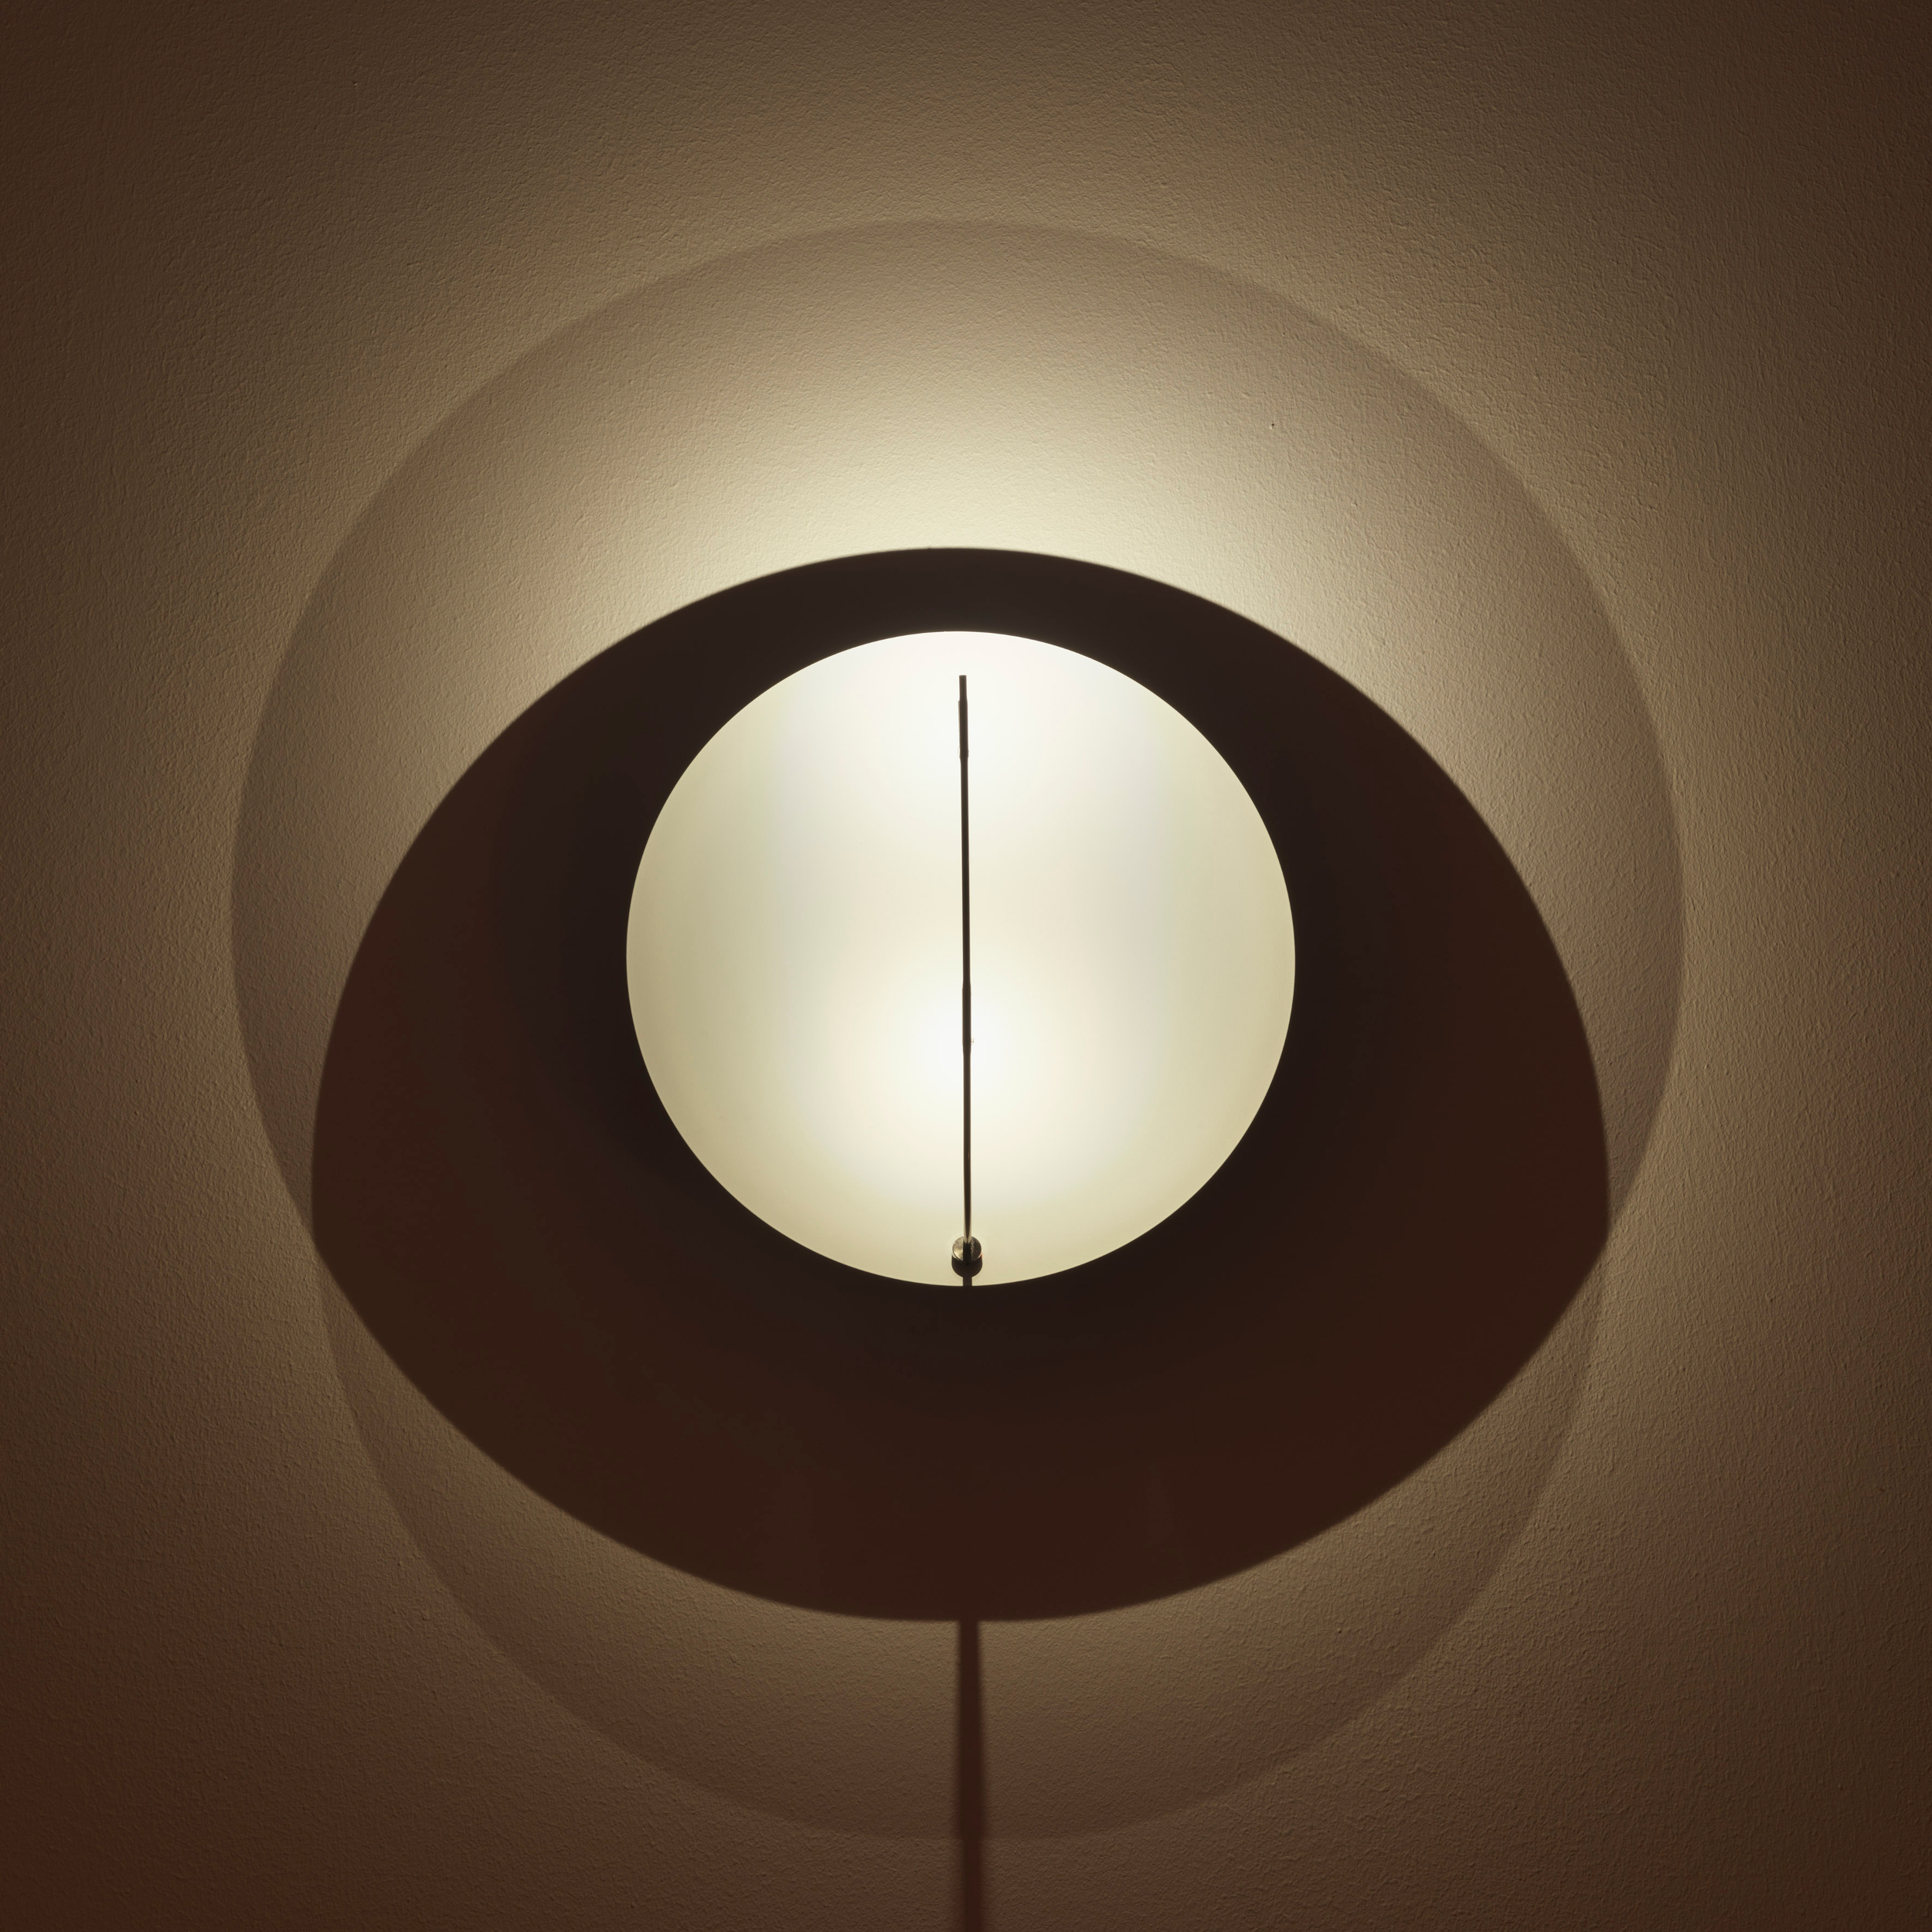 Luna Parete 2 LED Wall Light